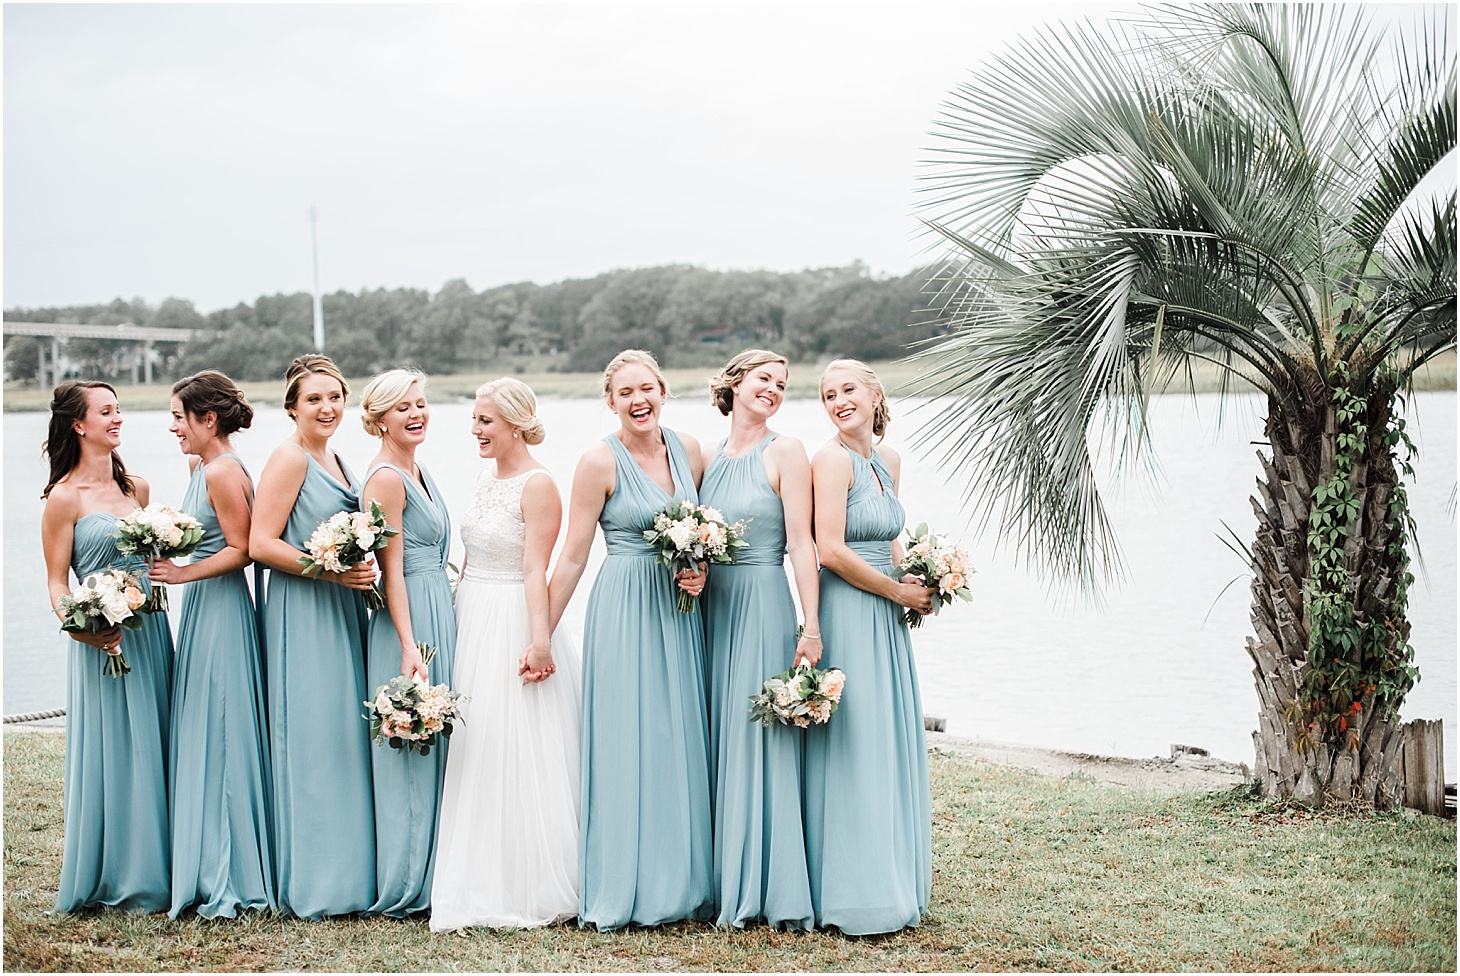 wilmington_wedding_photographer_1122.jpg